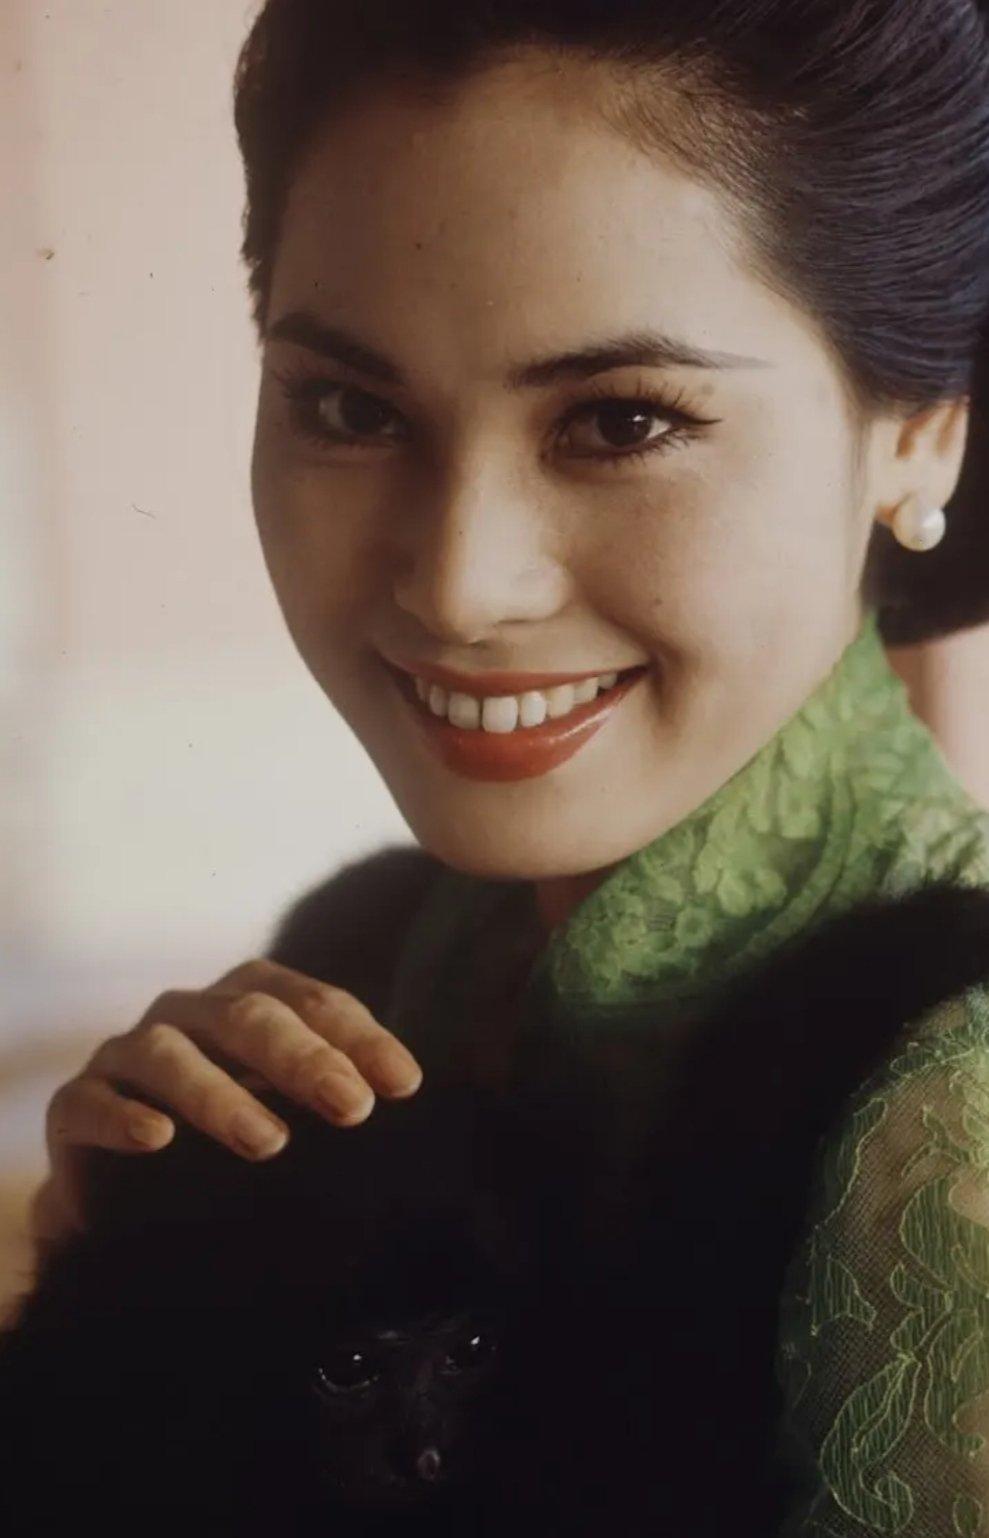 Potret Kecantikan Dewi Soekarno, Istri ke- 5 Bung Karno, Semasa Muda 3